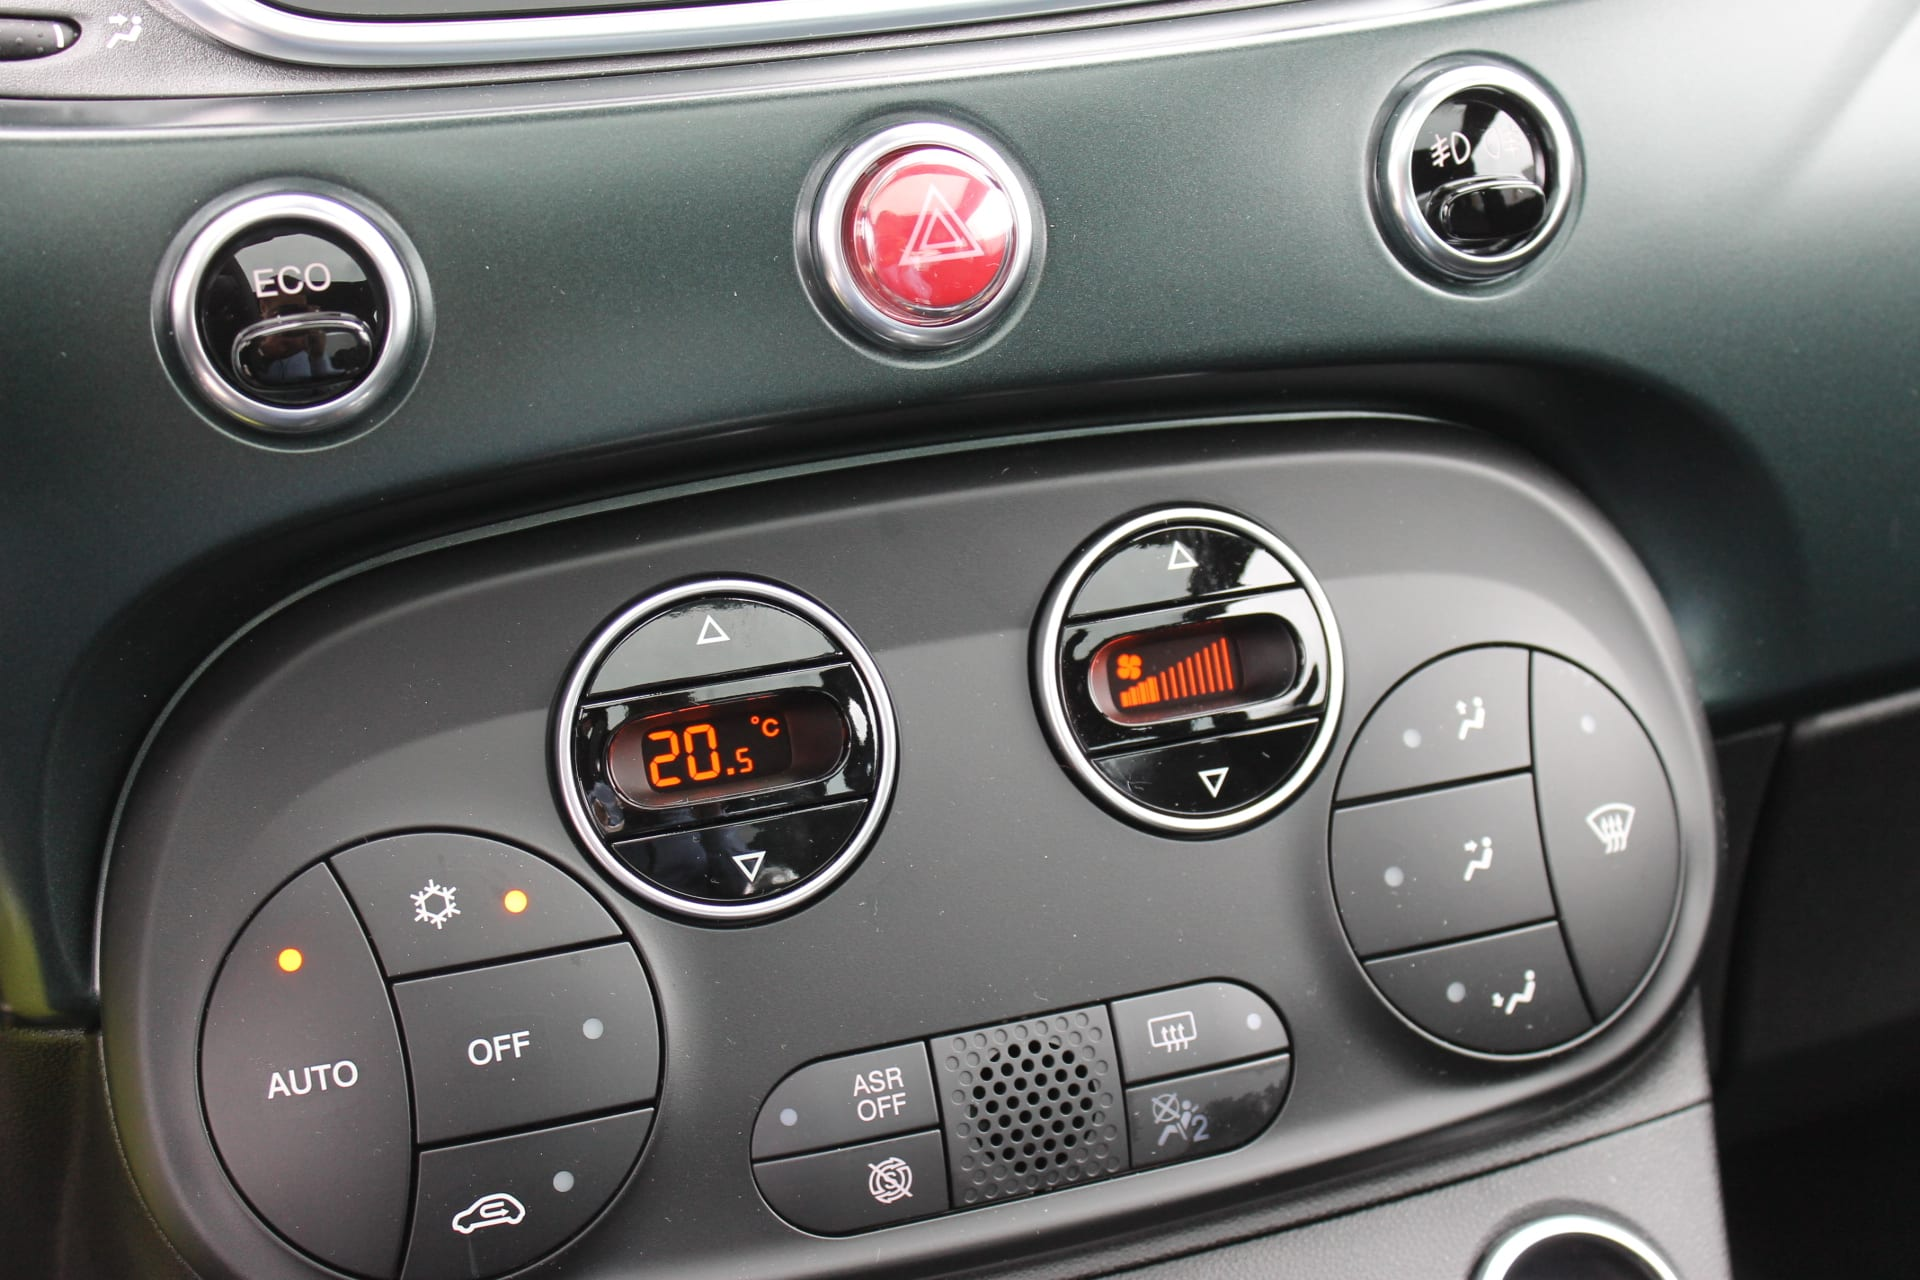 Fiat 500 Rockstar matgroen - temperatuurregelaar